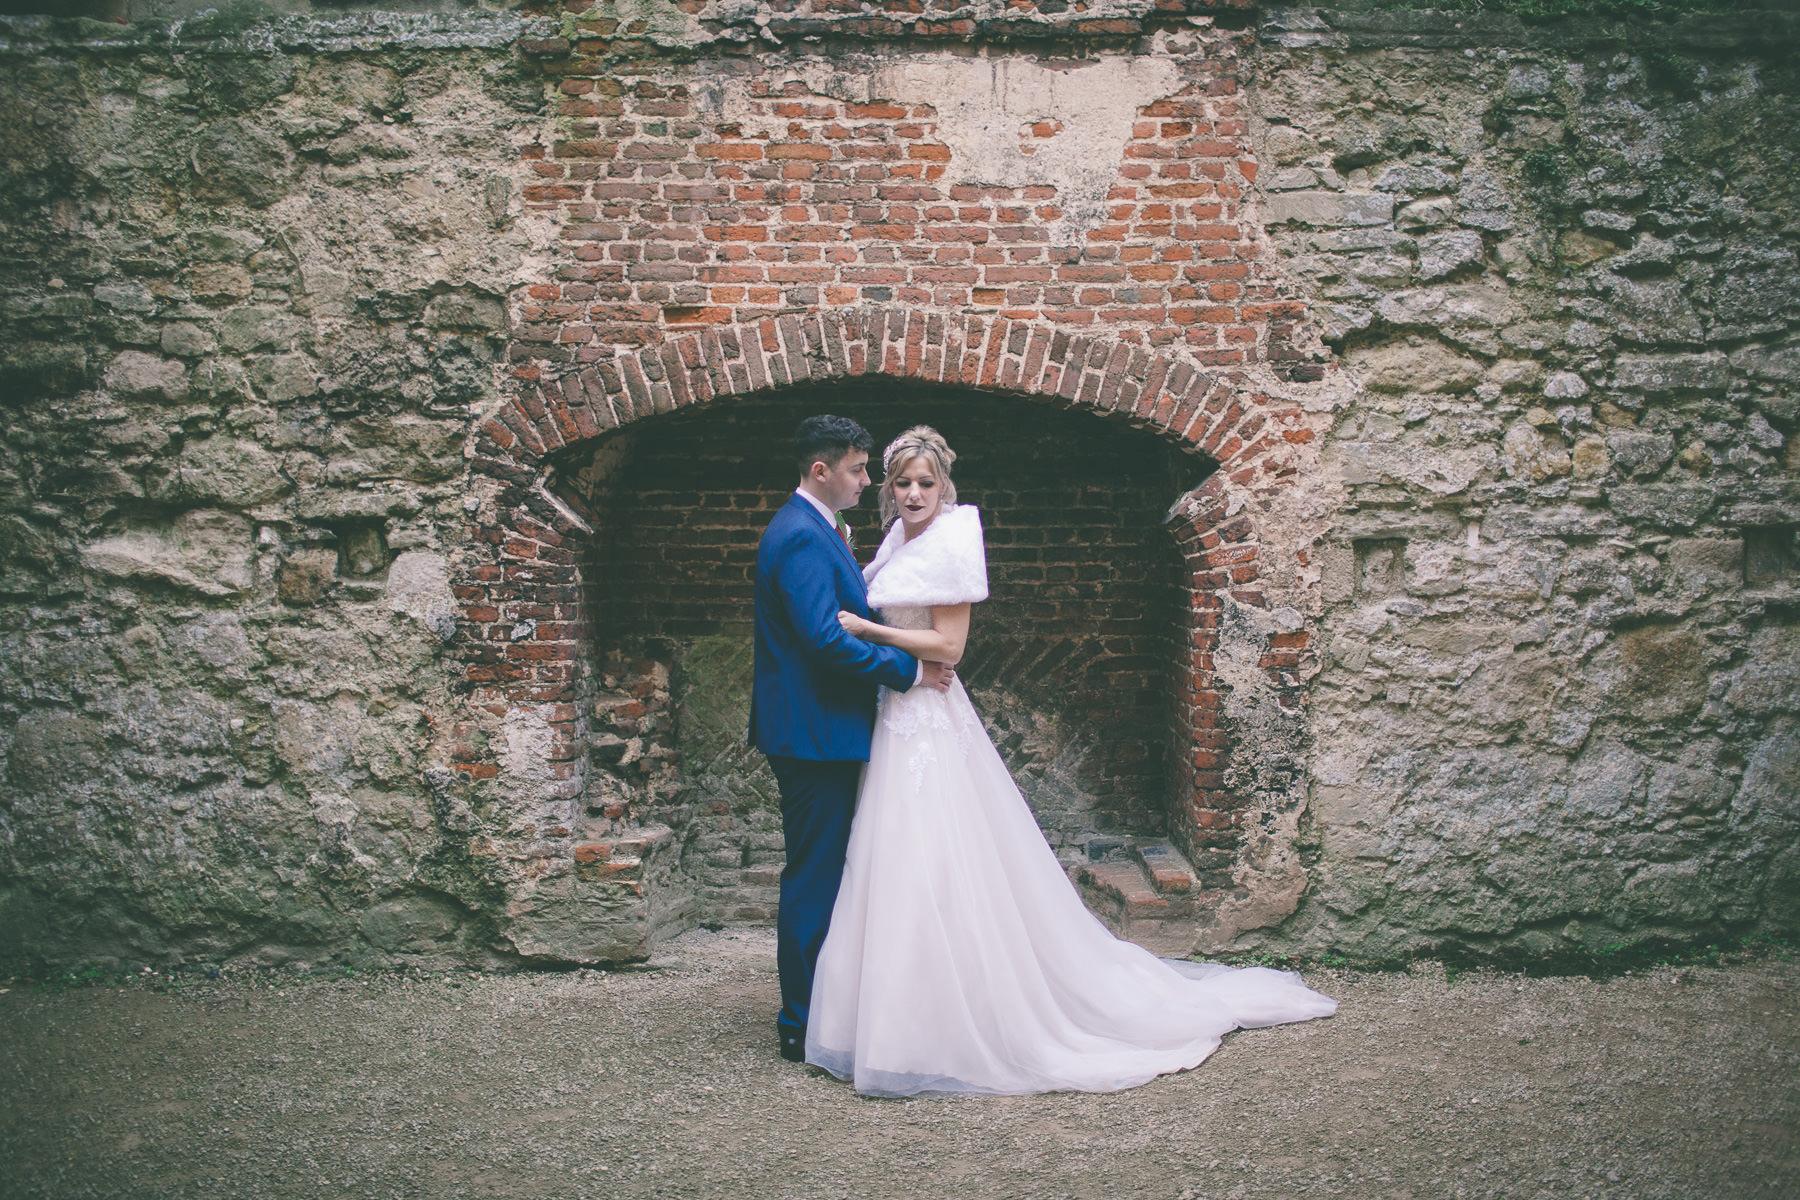 Titchfield-abbey-fareham-registry-wedding-photography-Jessica-and-Lance-web-112